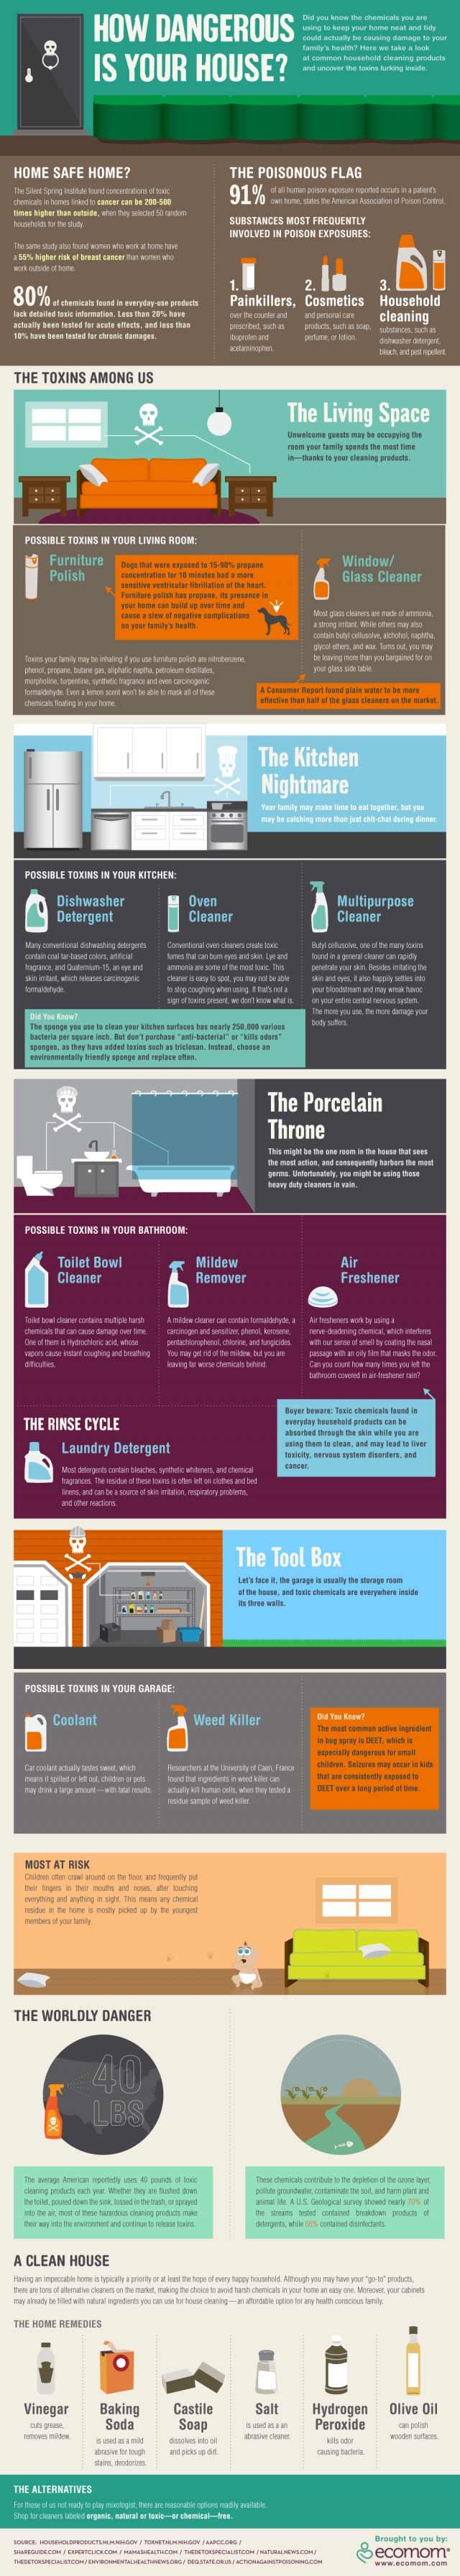 Dangerous-House-infographic